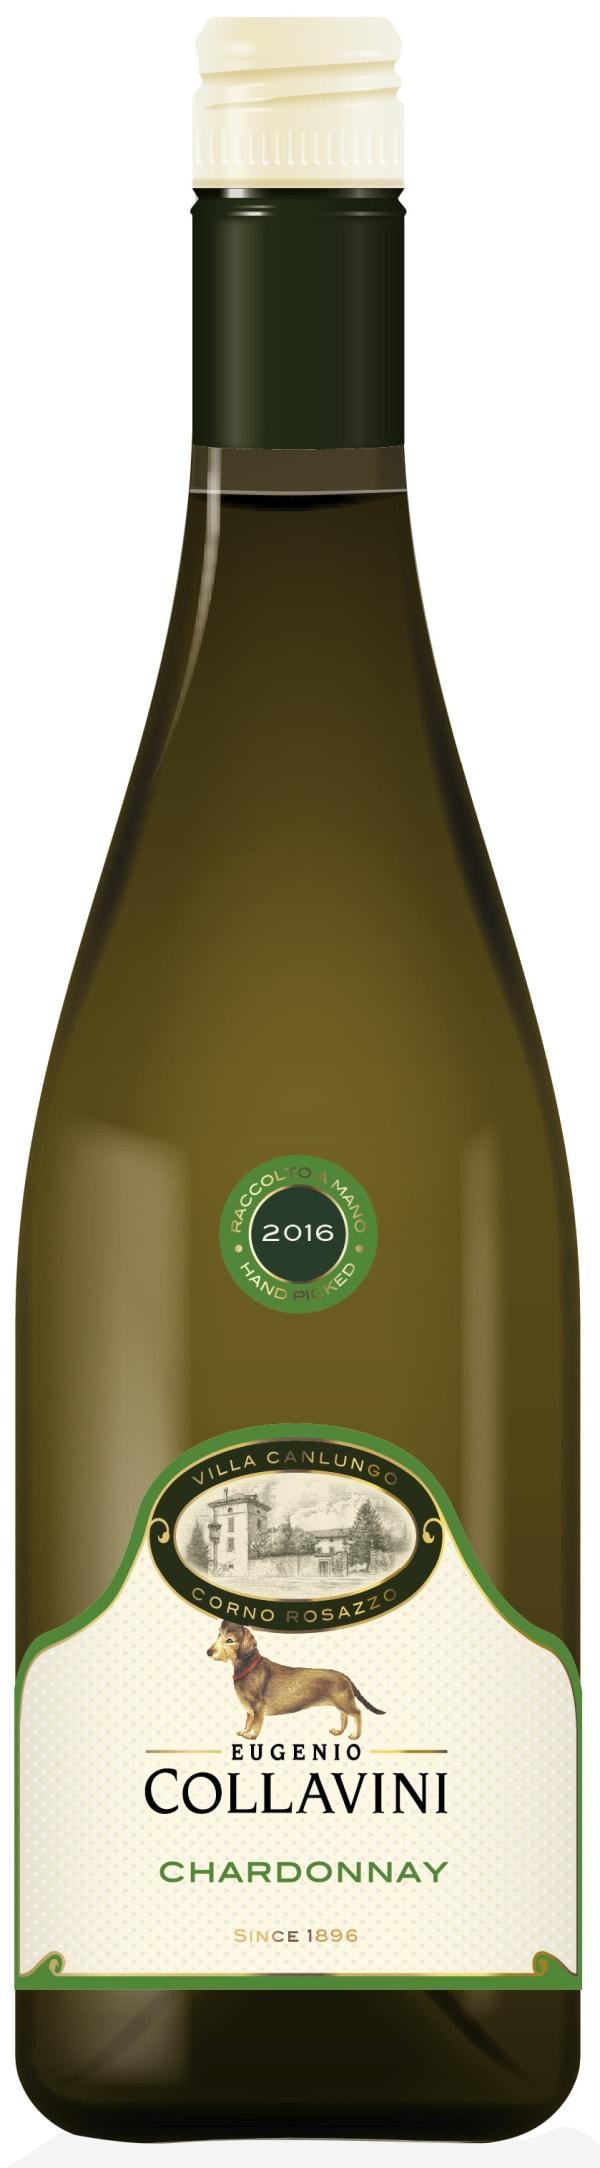 Collavini Chardonnay dei Sassi Cavi 2016